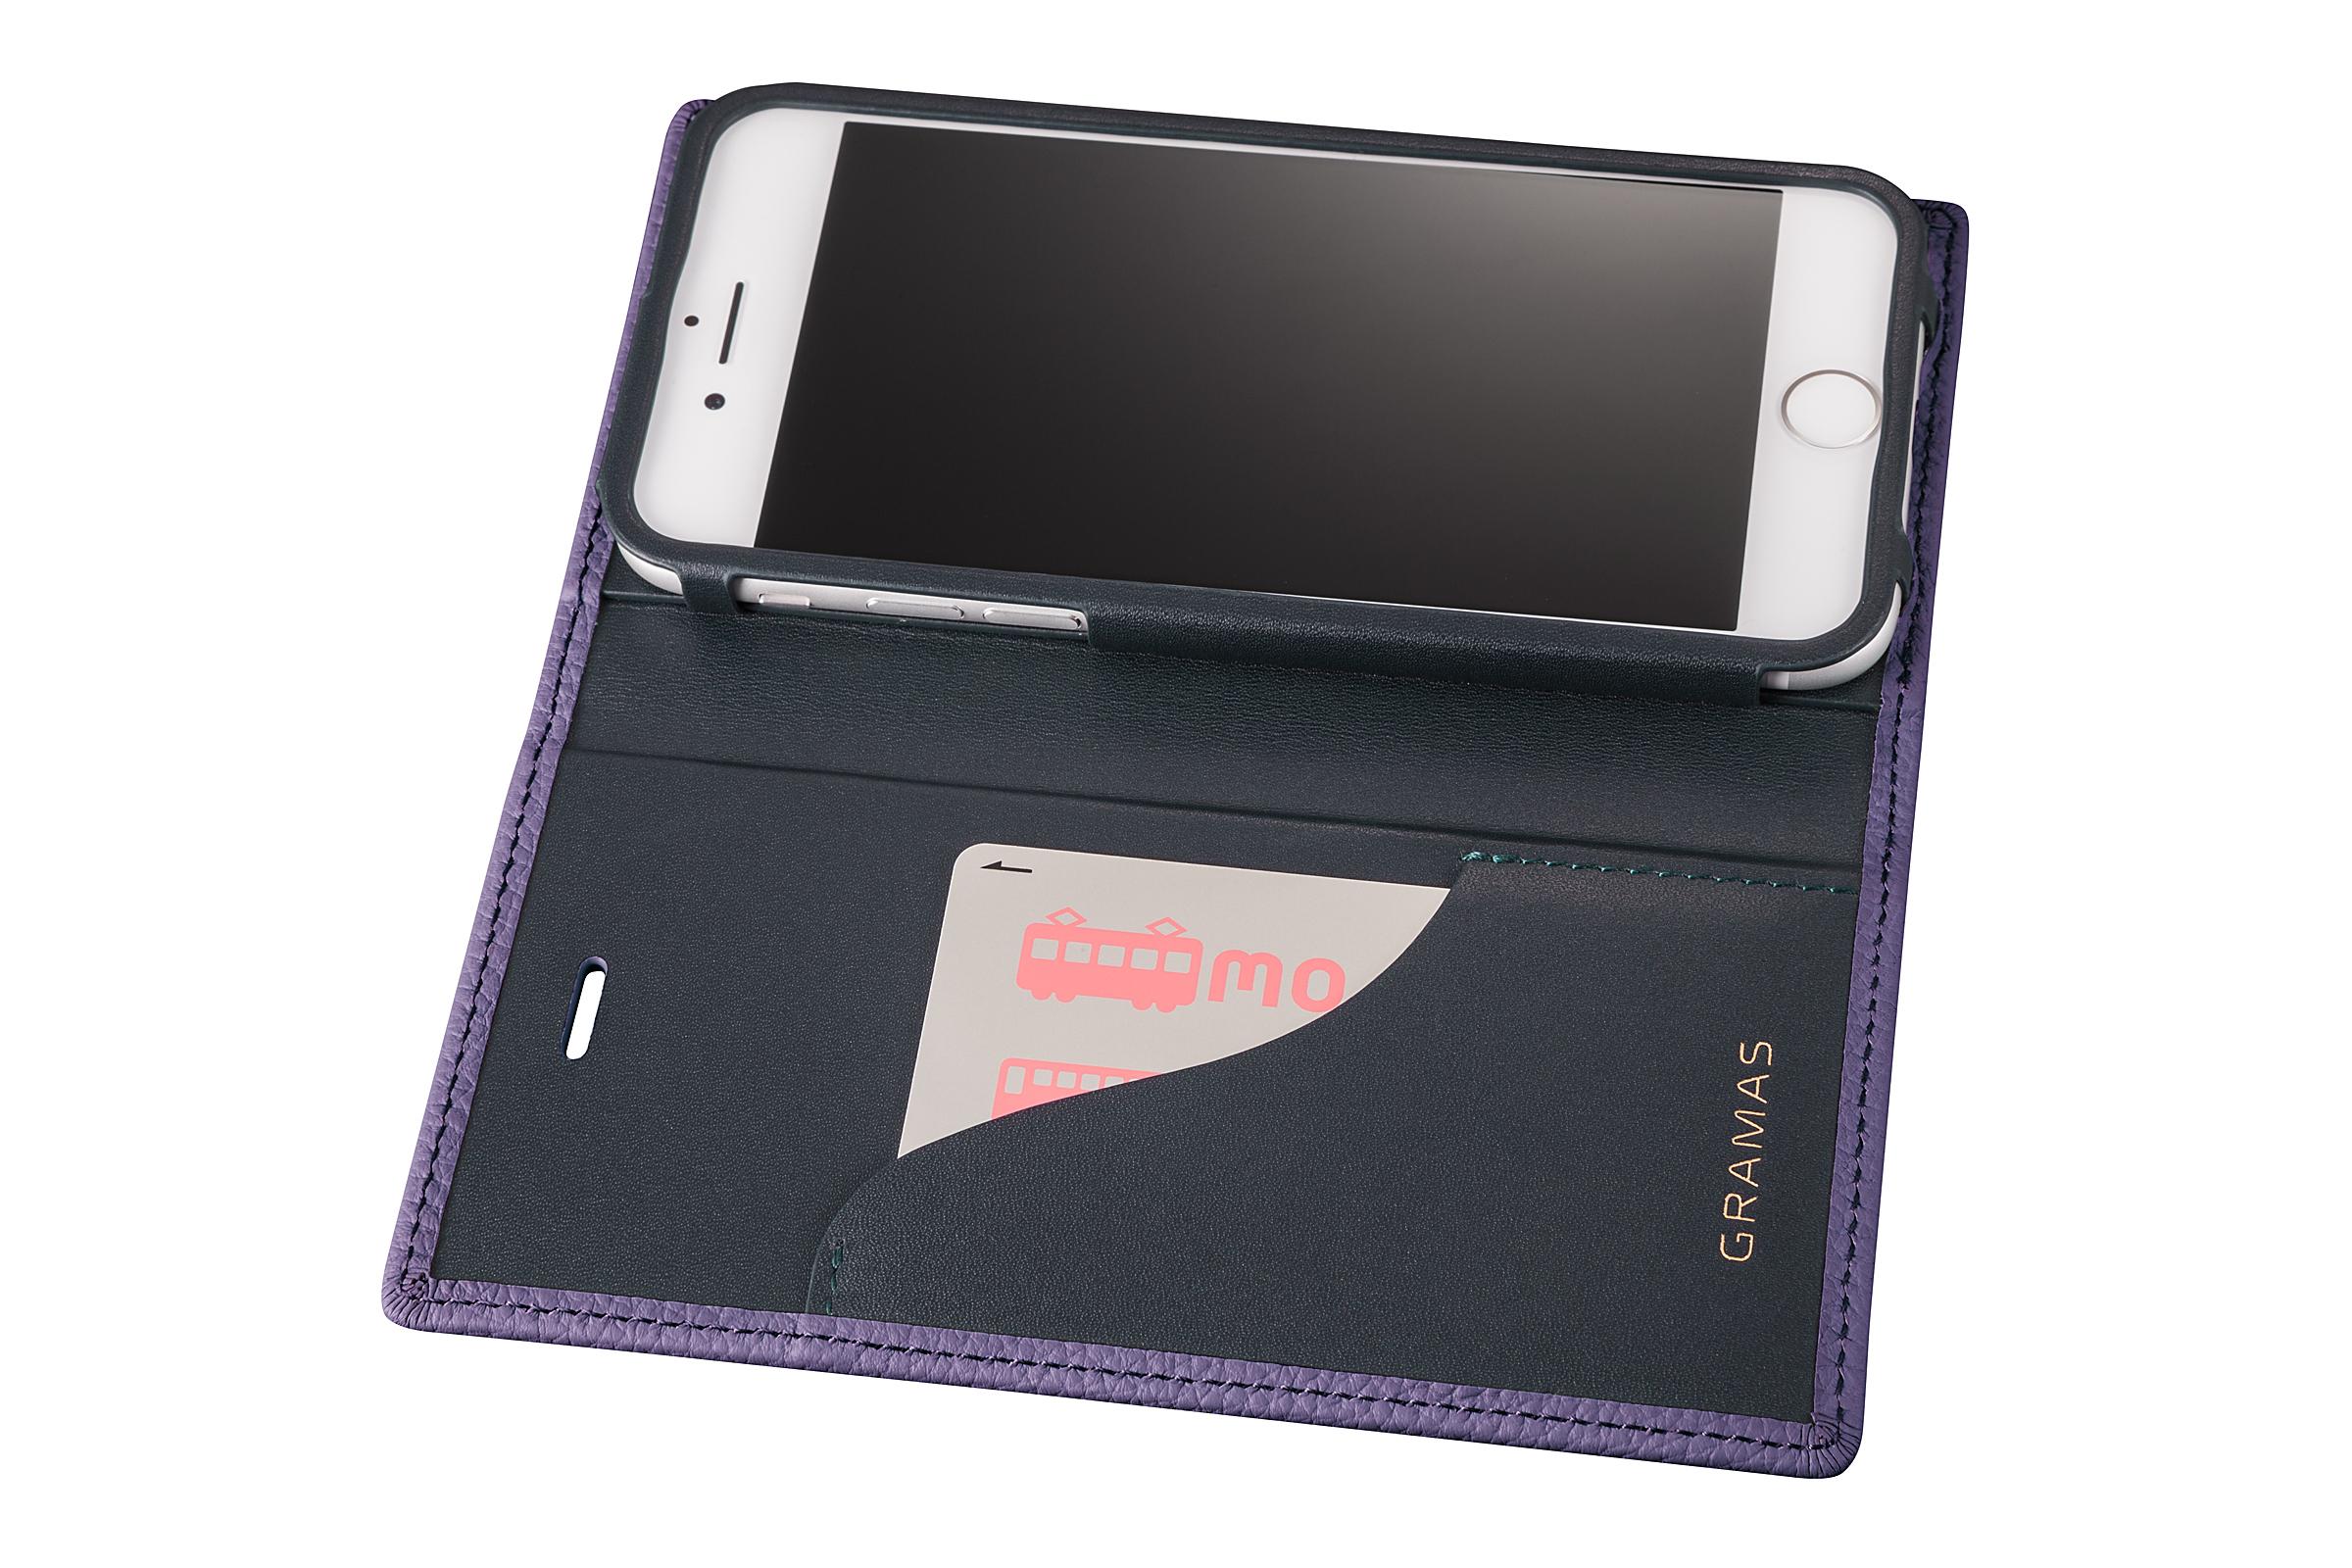 GRAMAS Shrunken-calf Full Leather Case for iPhone 7(Purple) シュランケンカーフ 手帳型フルレザーケース GLC646PR - 画像4